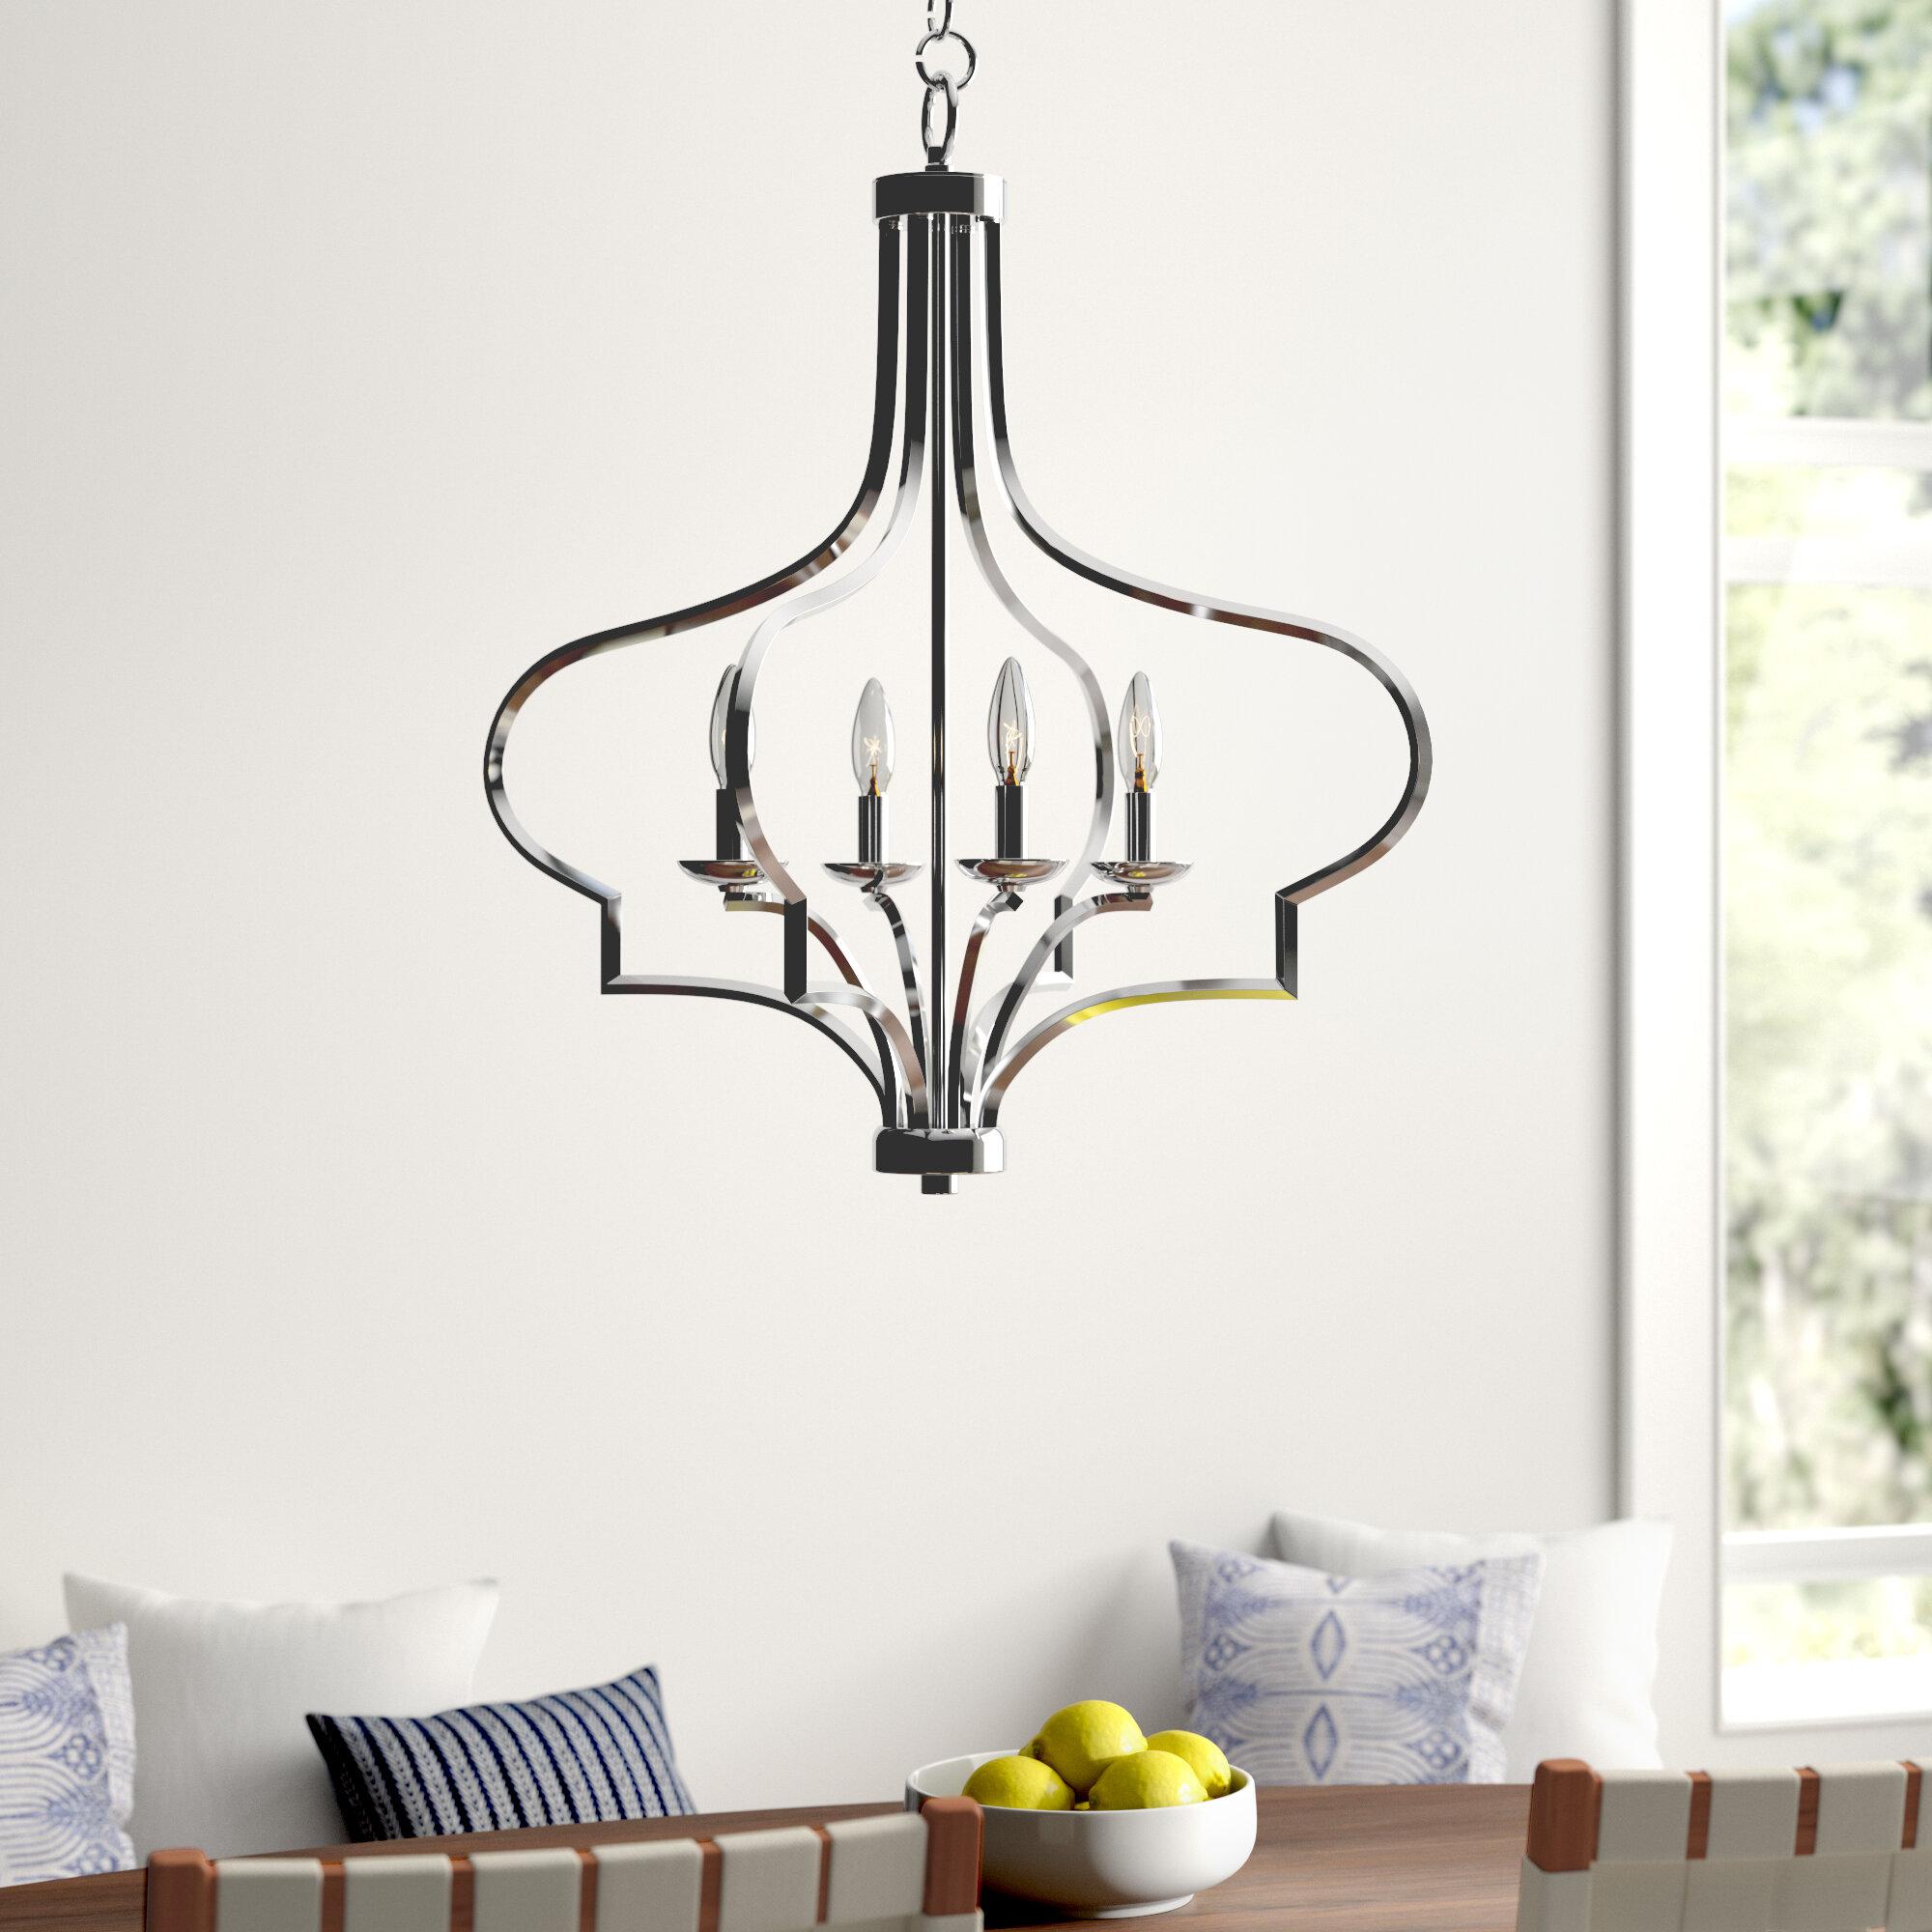 Mistana Soussi 4 Light Lantern Geometric Chandelier Reviews Wayfair